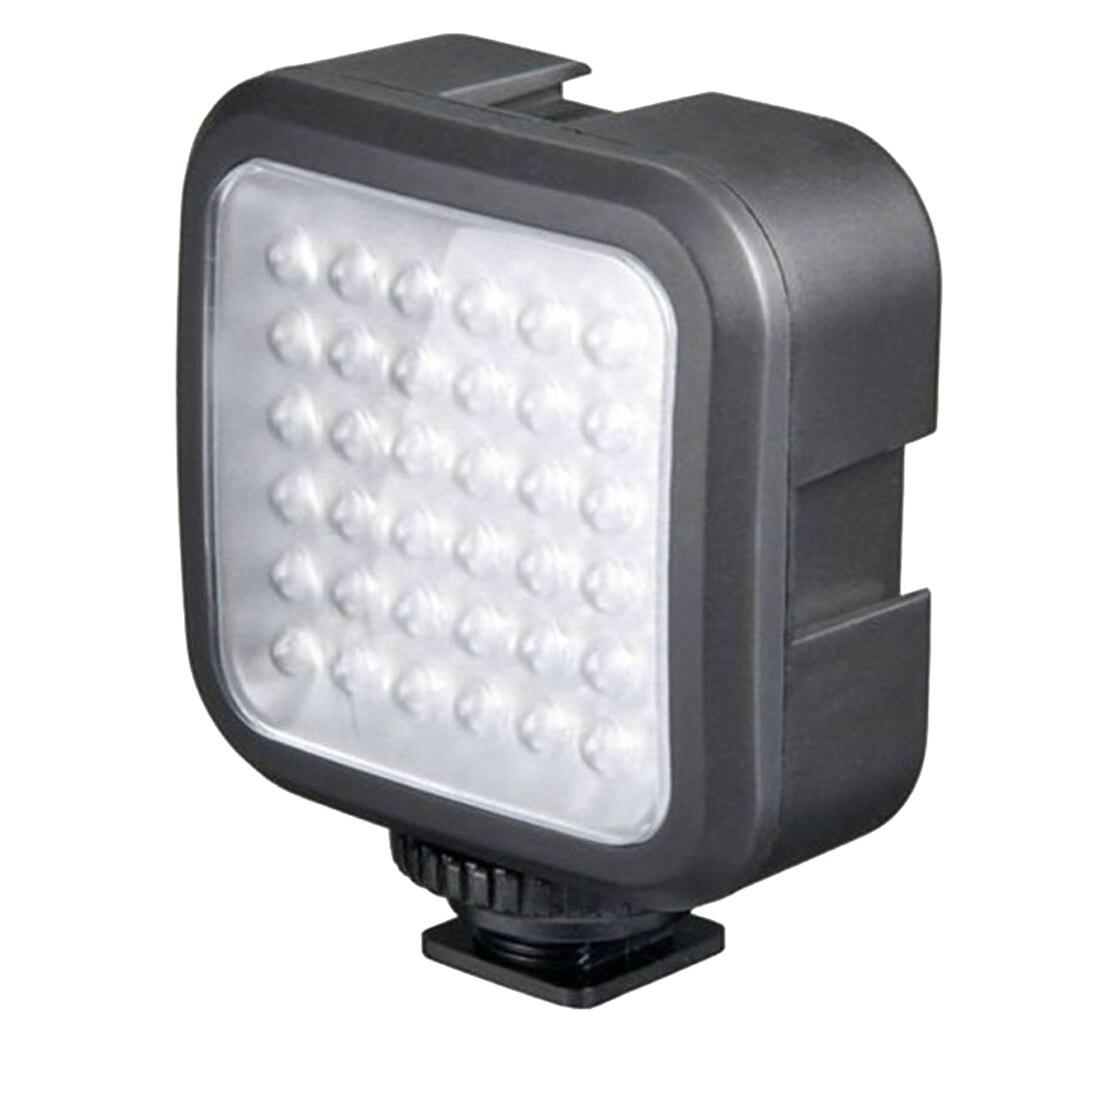 F14114 Professional Super Bright 36 LED 4W 6400K White Lamp Fill Light for HERO3/3+/4/5 SJ4000 Sport Camera Camcorder FS